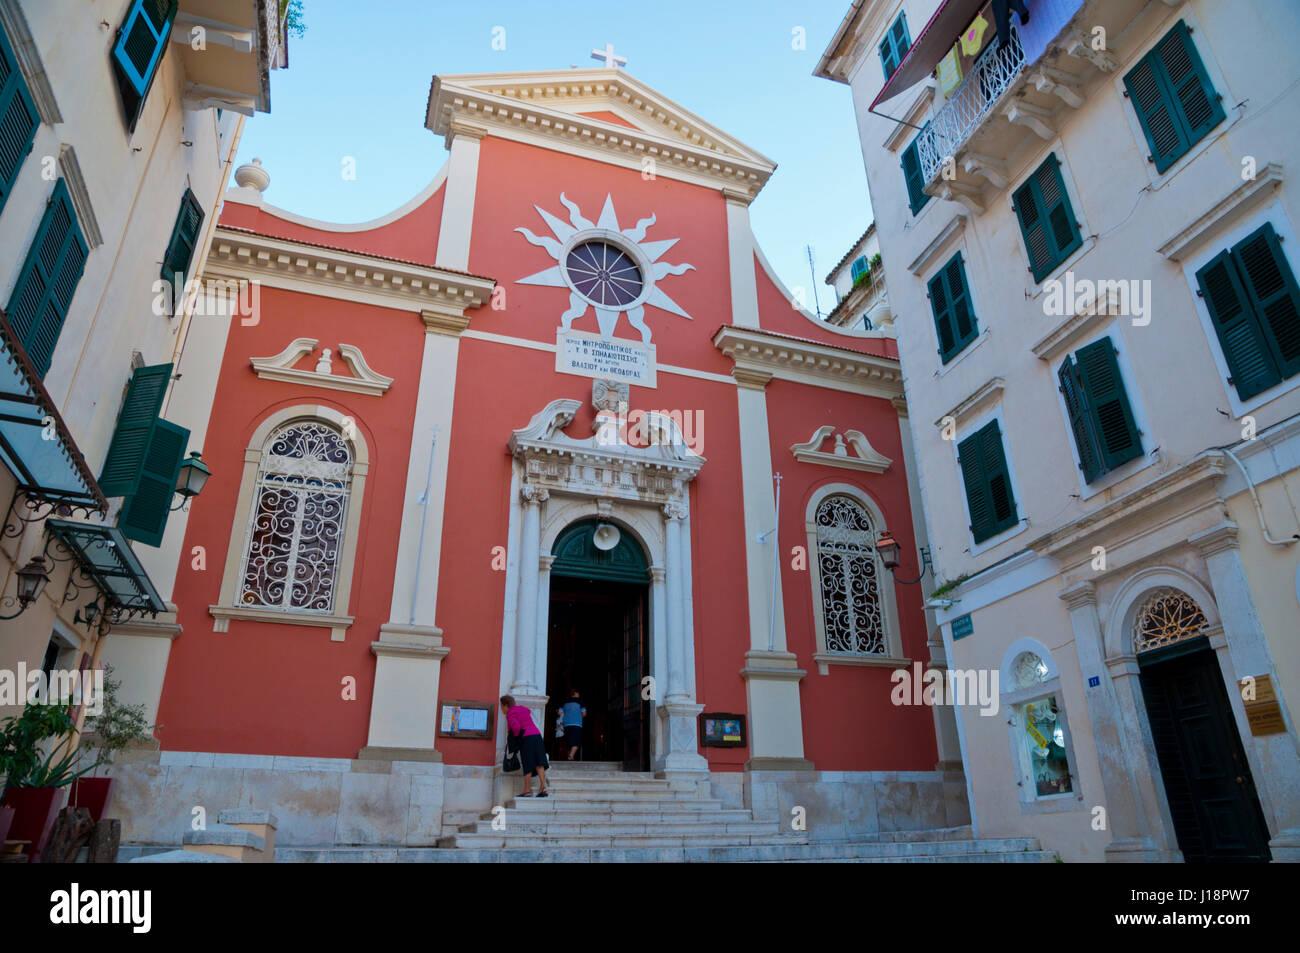 Metropolitan church Panaghia Spiliotissa, Old town, Corfu town, Kerkyra, Corfu Island, Ionian islands, Greece - Stock Image